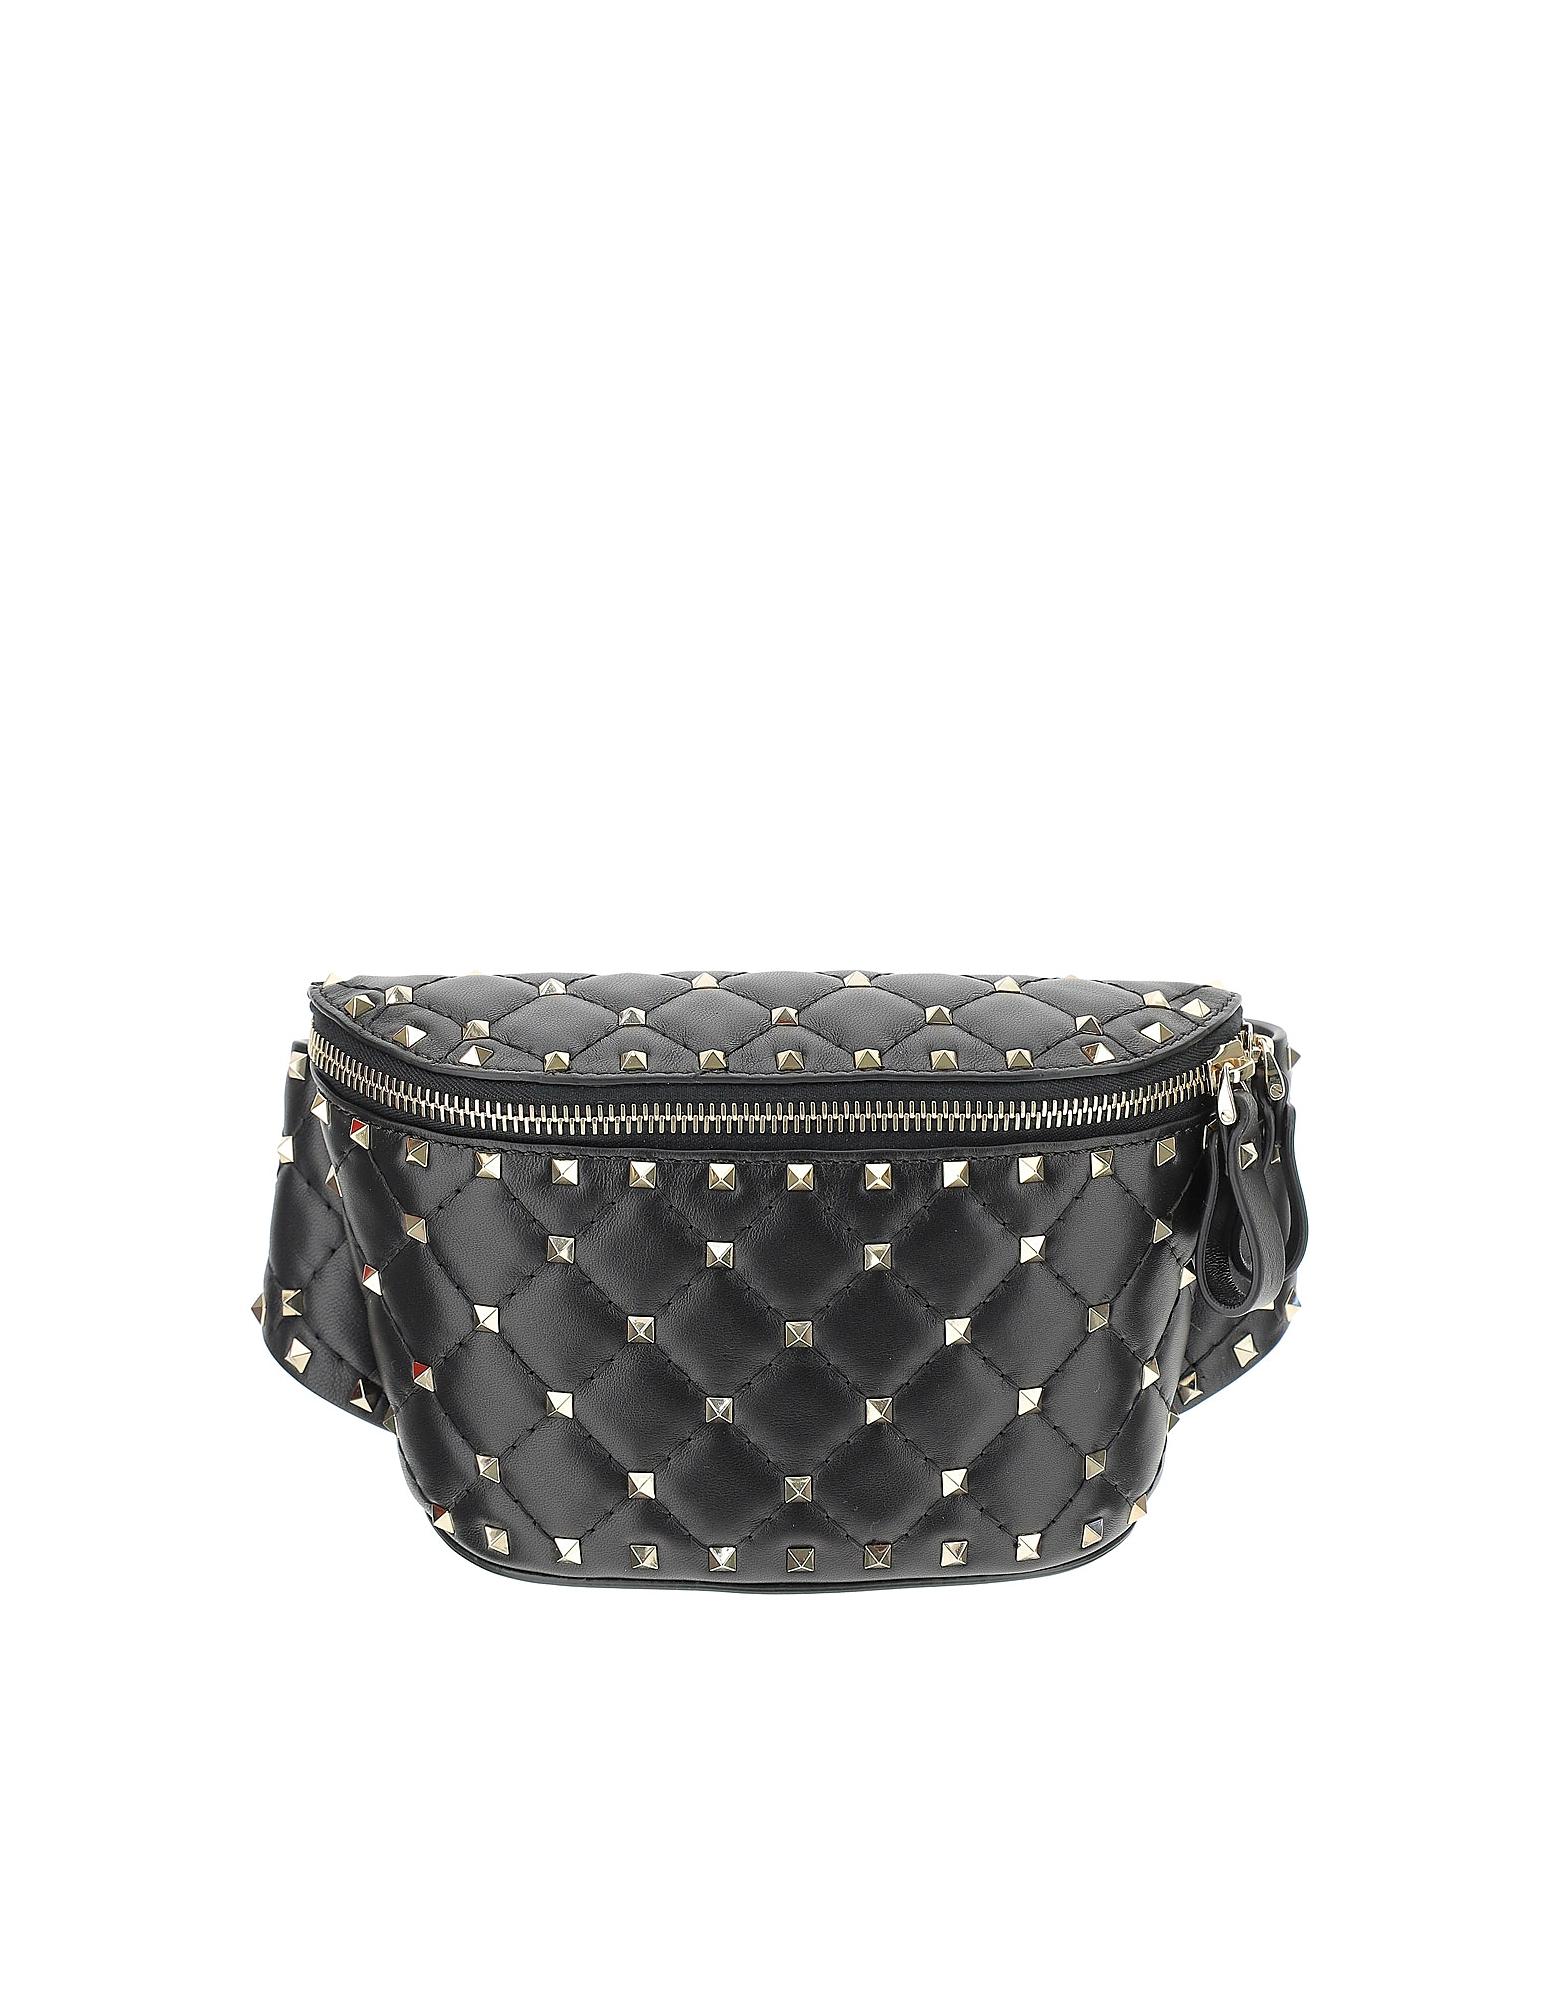 Valentino Designer Handbags, Black Rockstud Spike Belt Bag